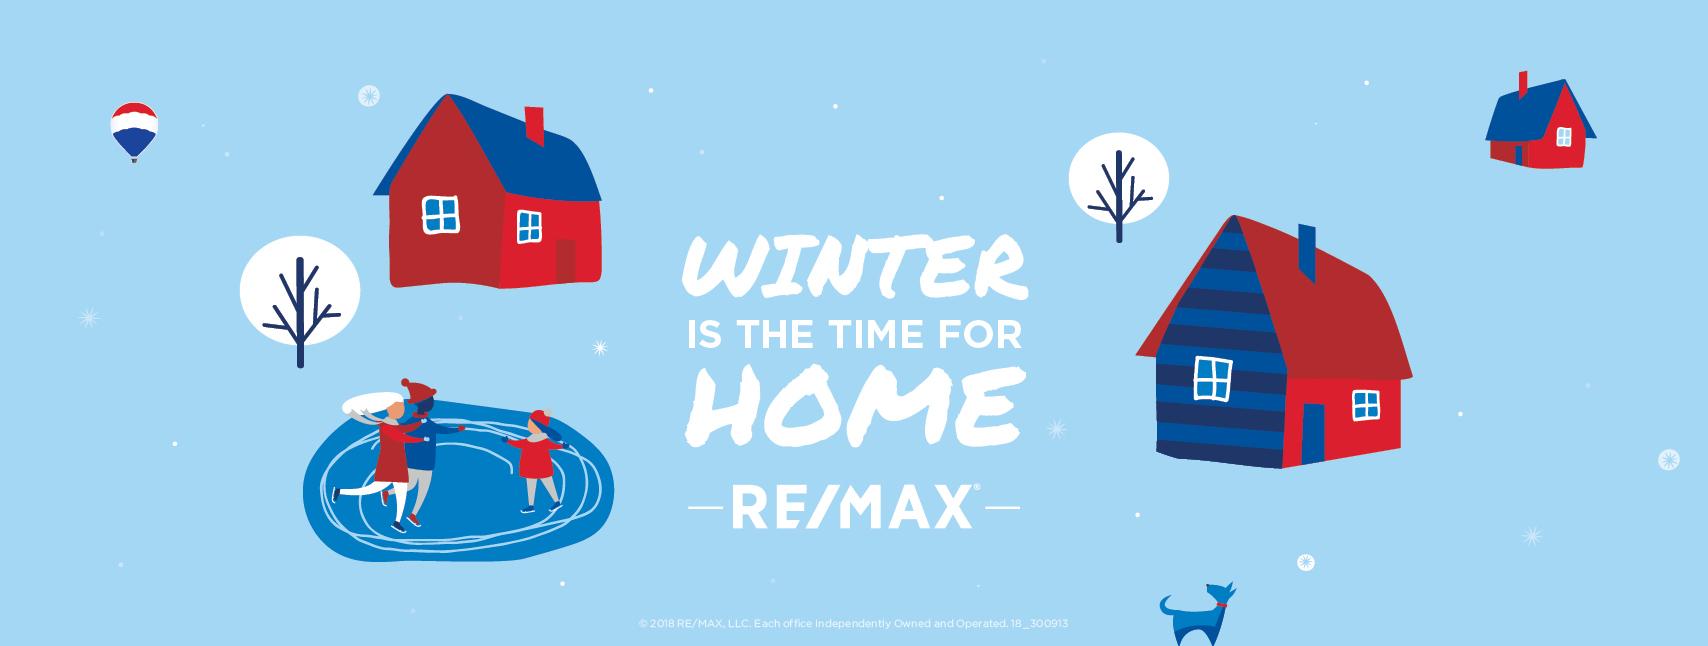 FB_WINTER218_300913_WinterHoliday-Cover-Home-Facebook.jpg